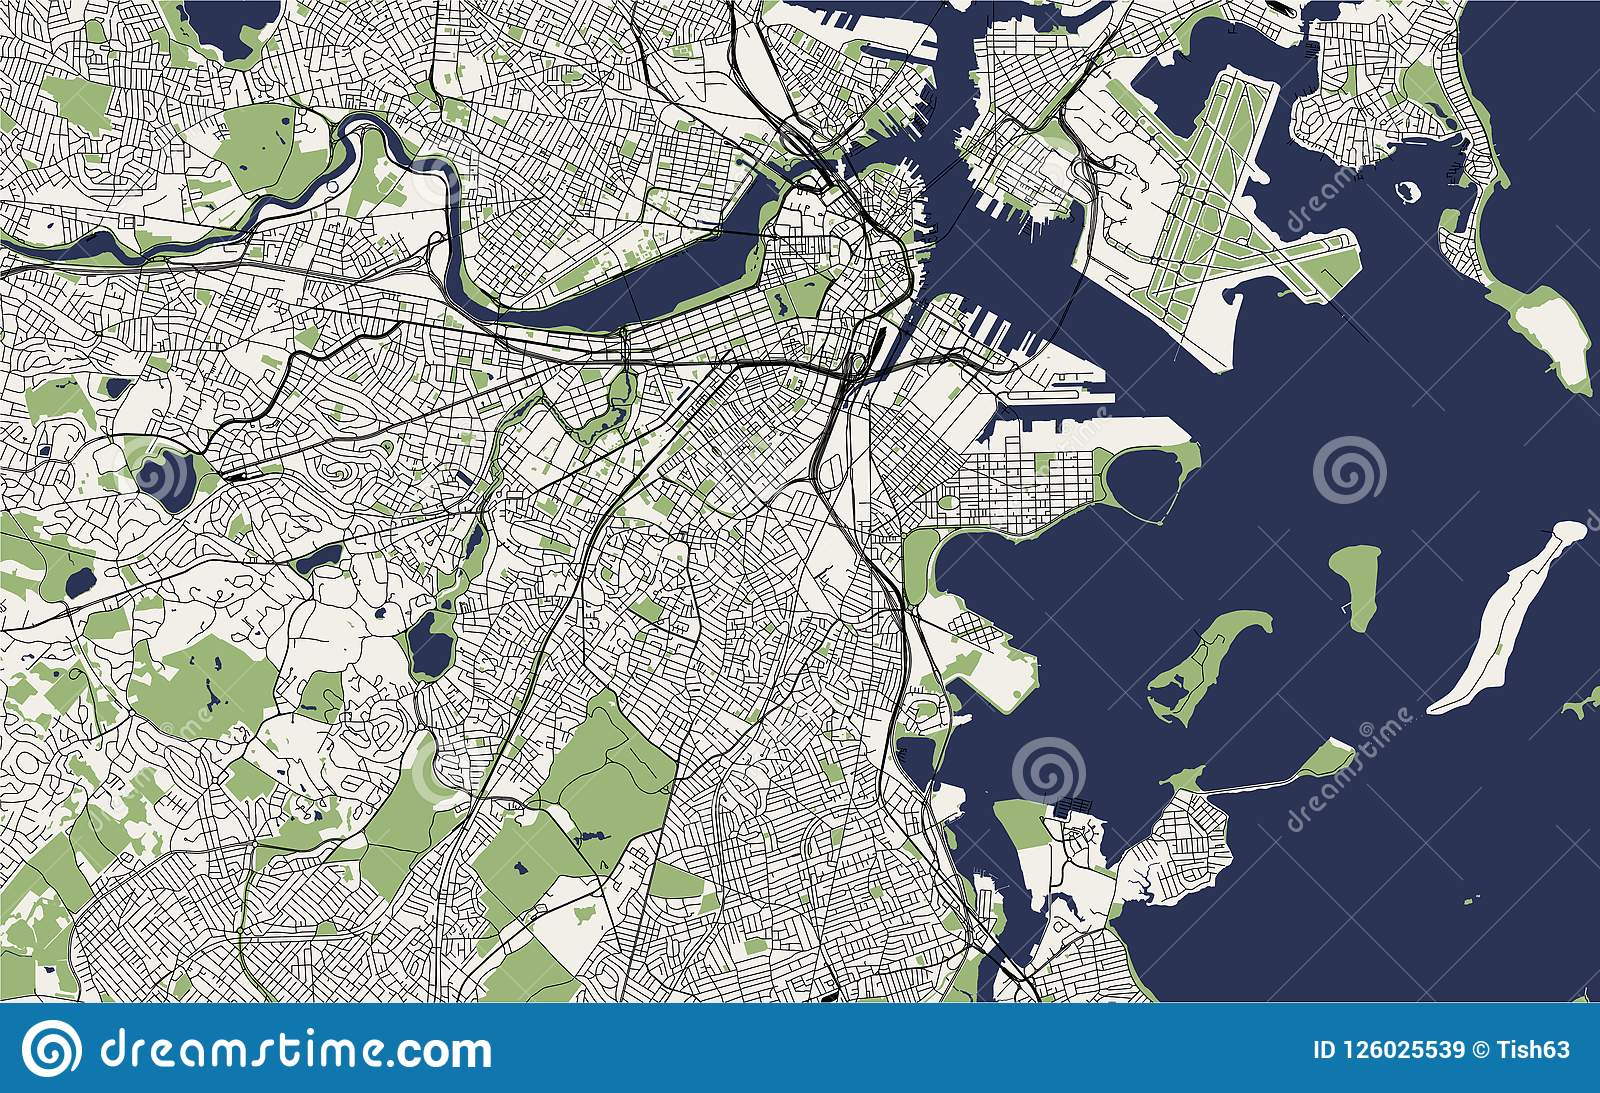 Map Of The City Of Boston, USA Stock Illustration - Illustration of ...